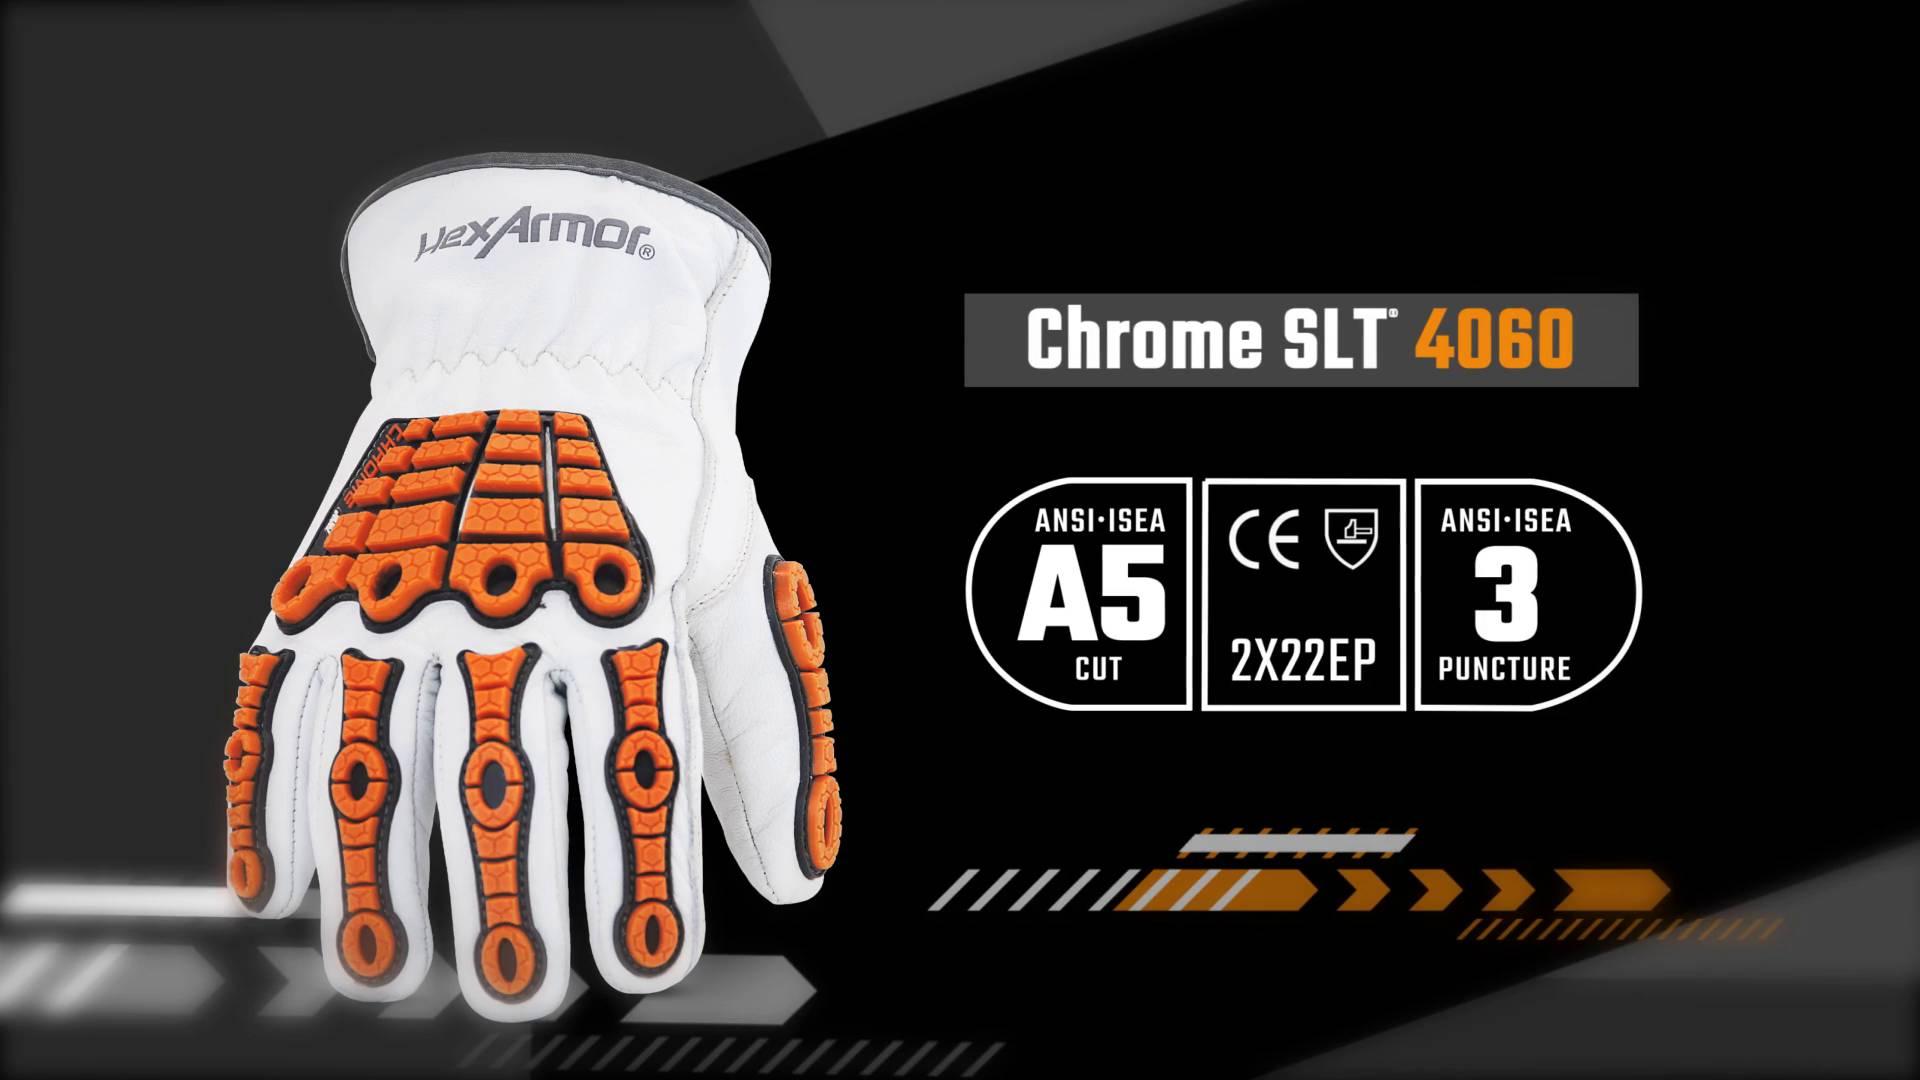 Chrome SLT® 4060 | HexArmor